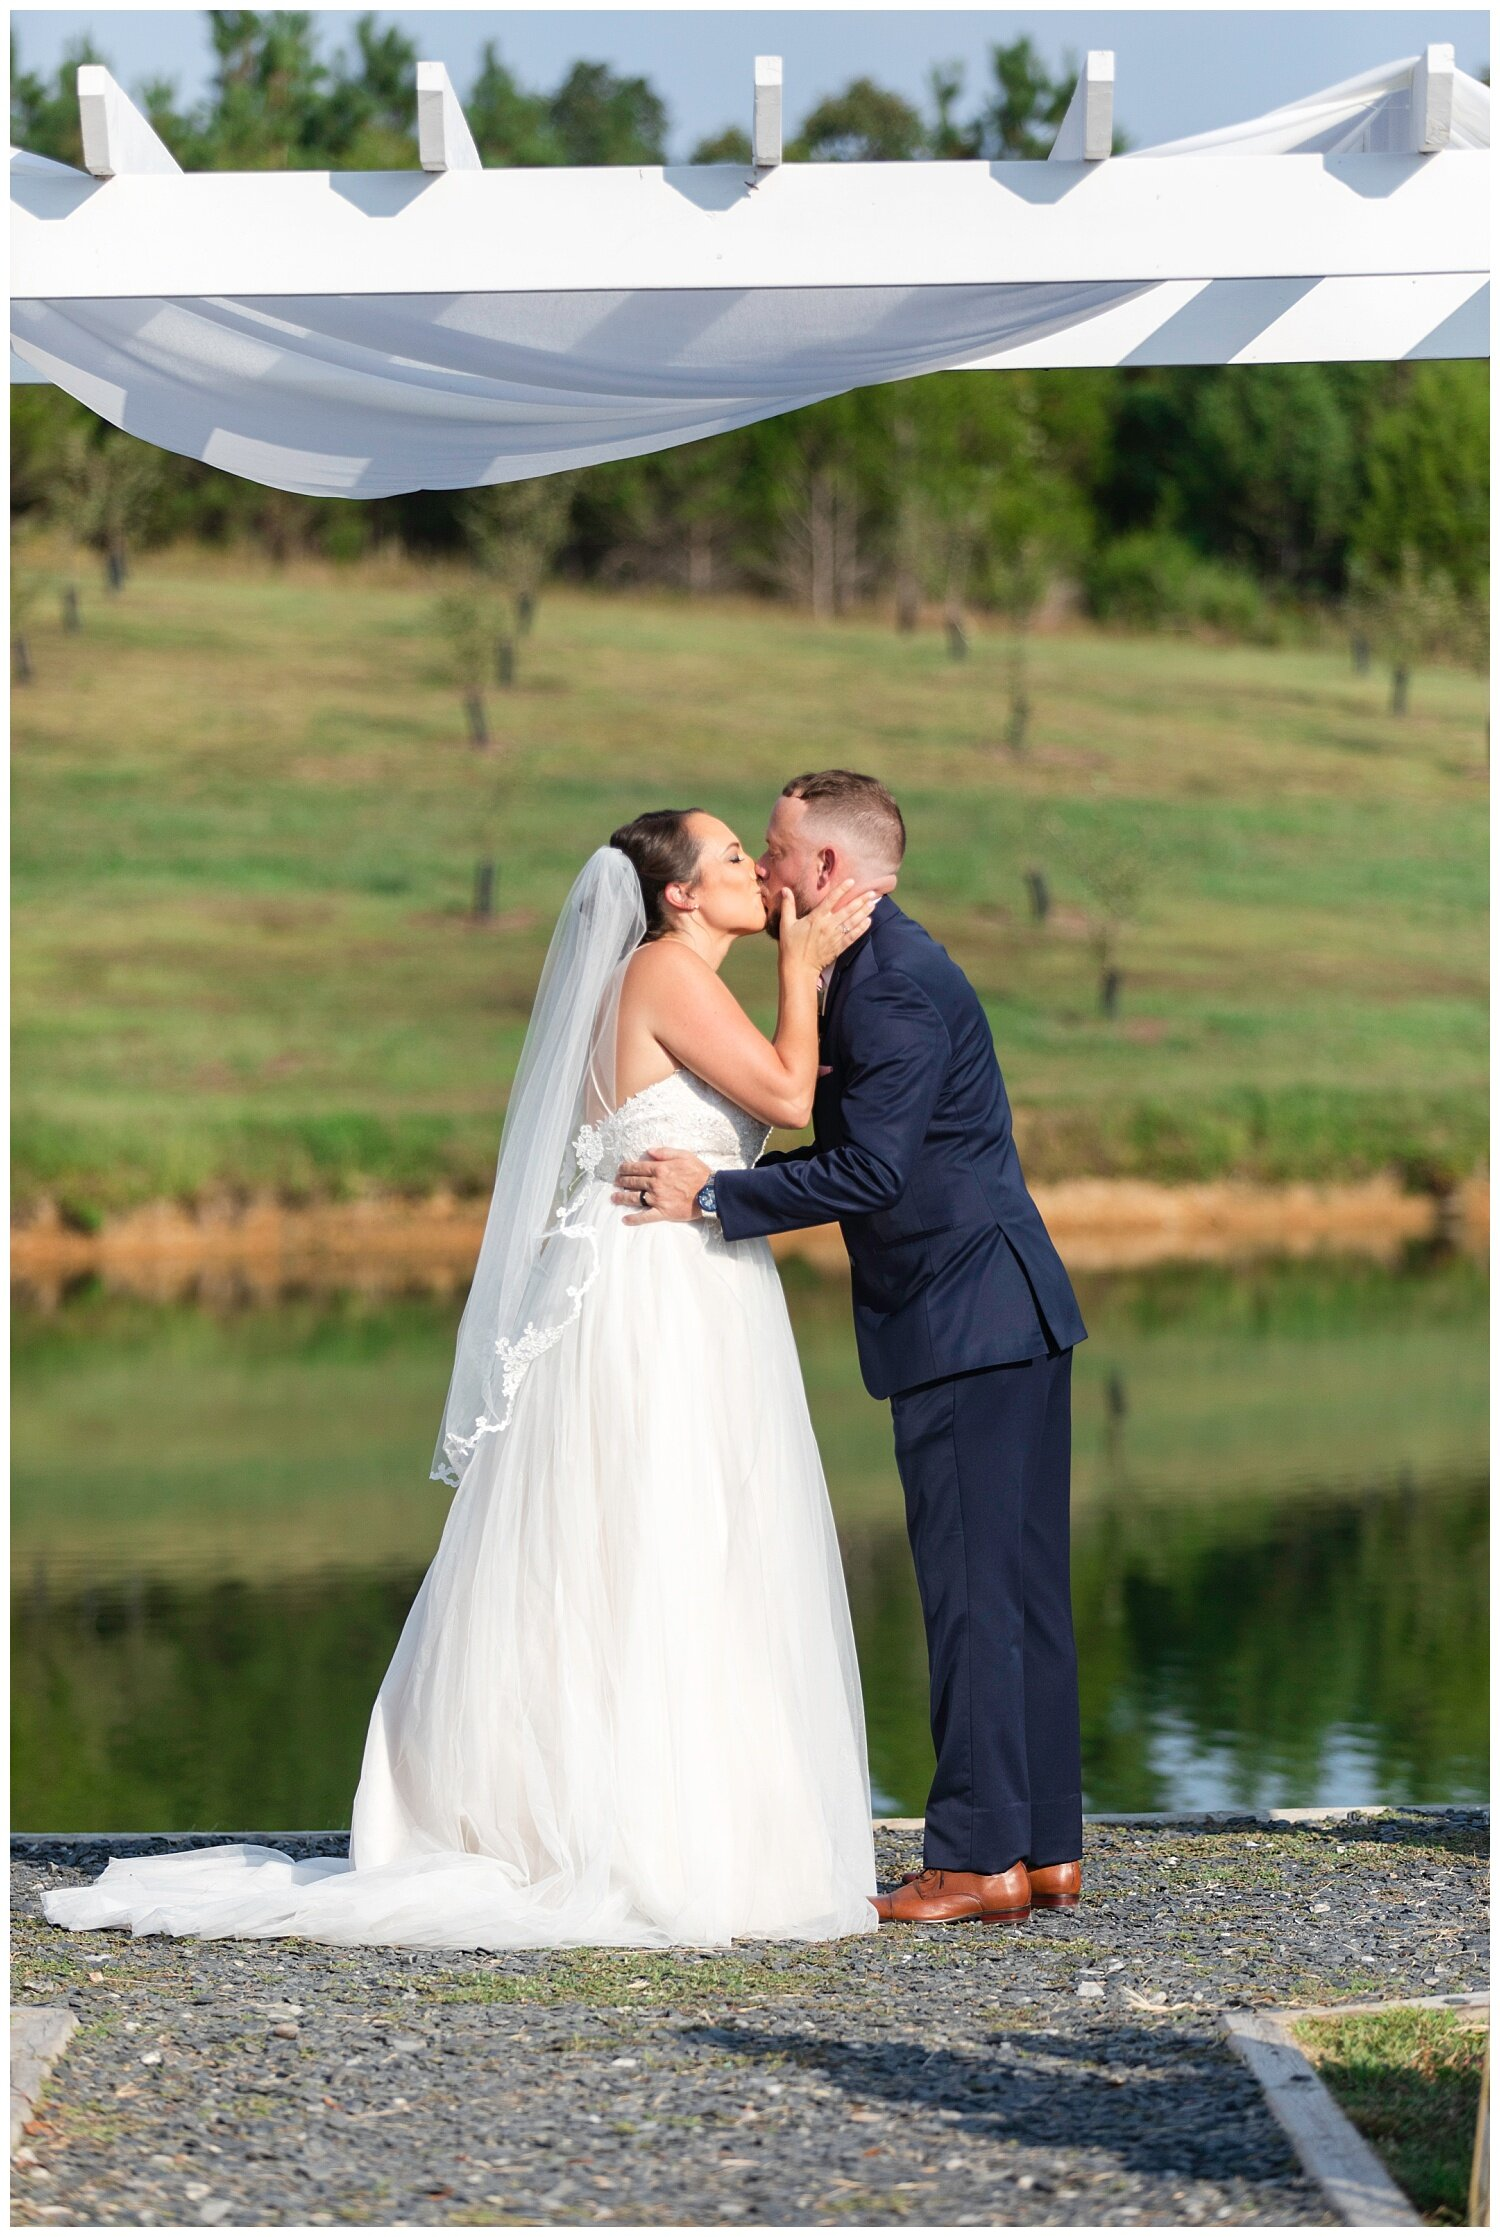 MJMP Richmond VA Wedding Photographer The Venue at Orchard View Farm Wedding Photo_0035.jpg